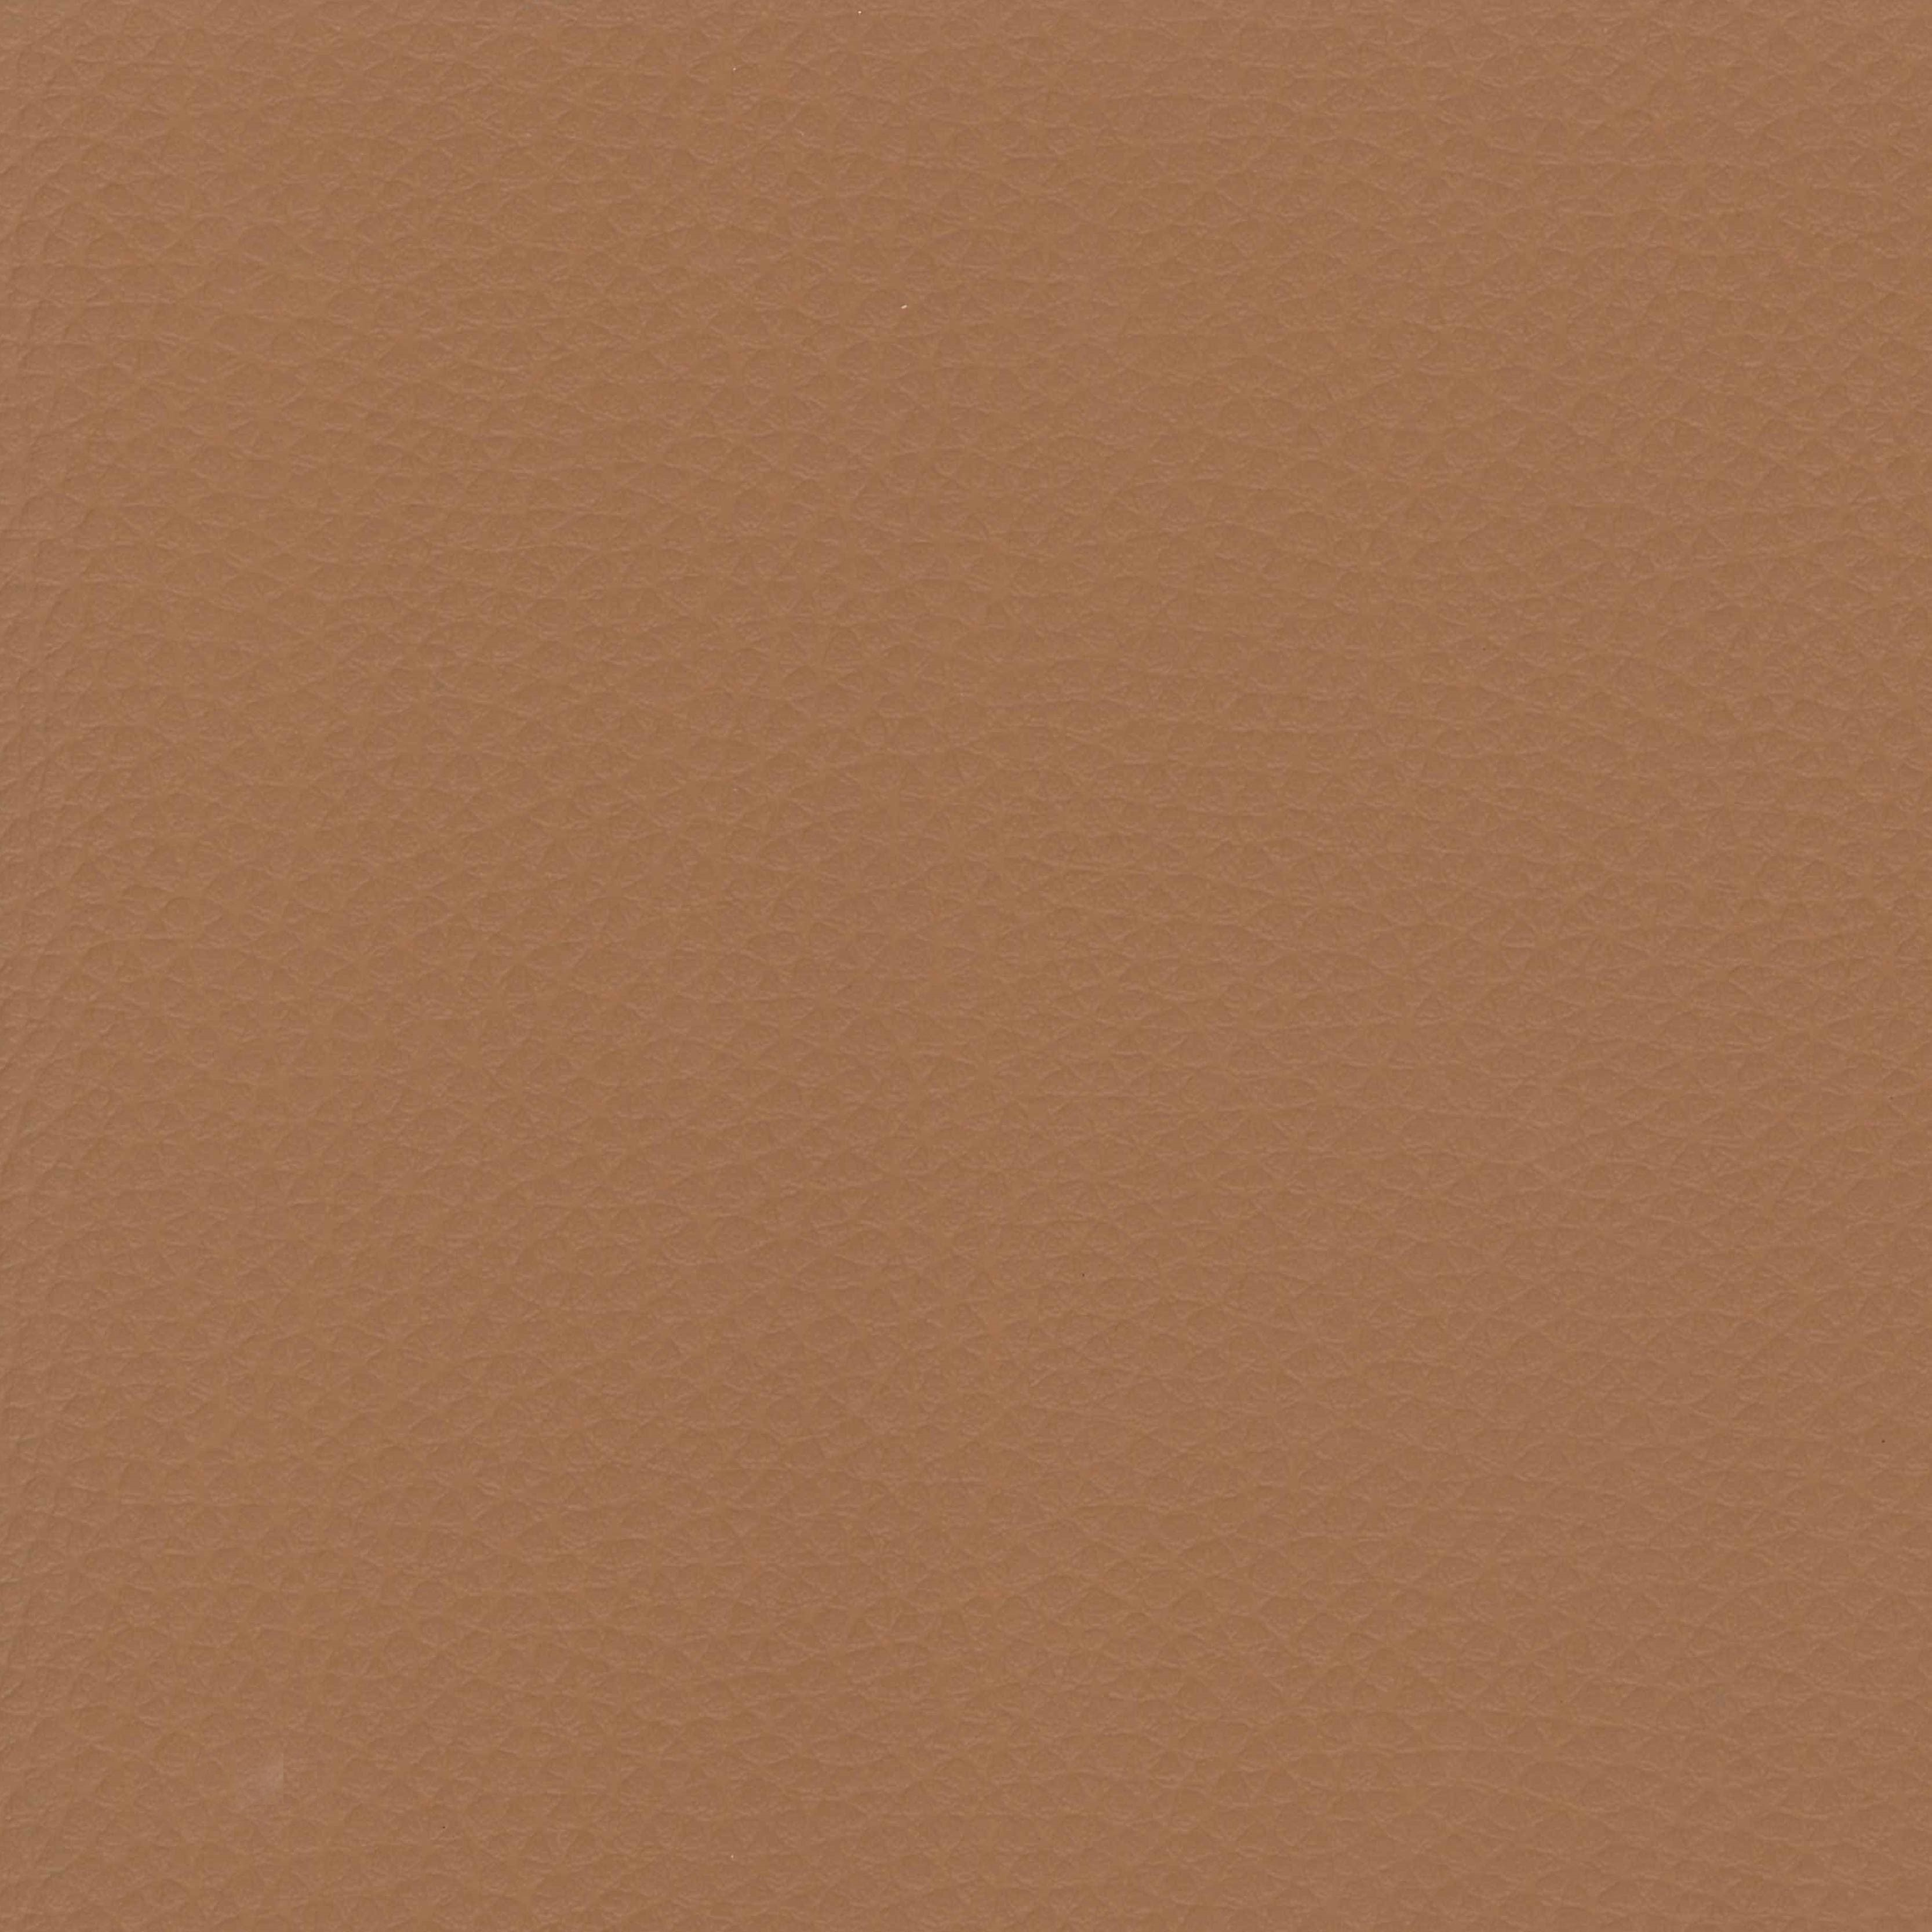 Yarwood Leather Dollaro Tan